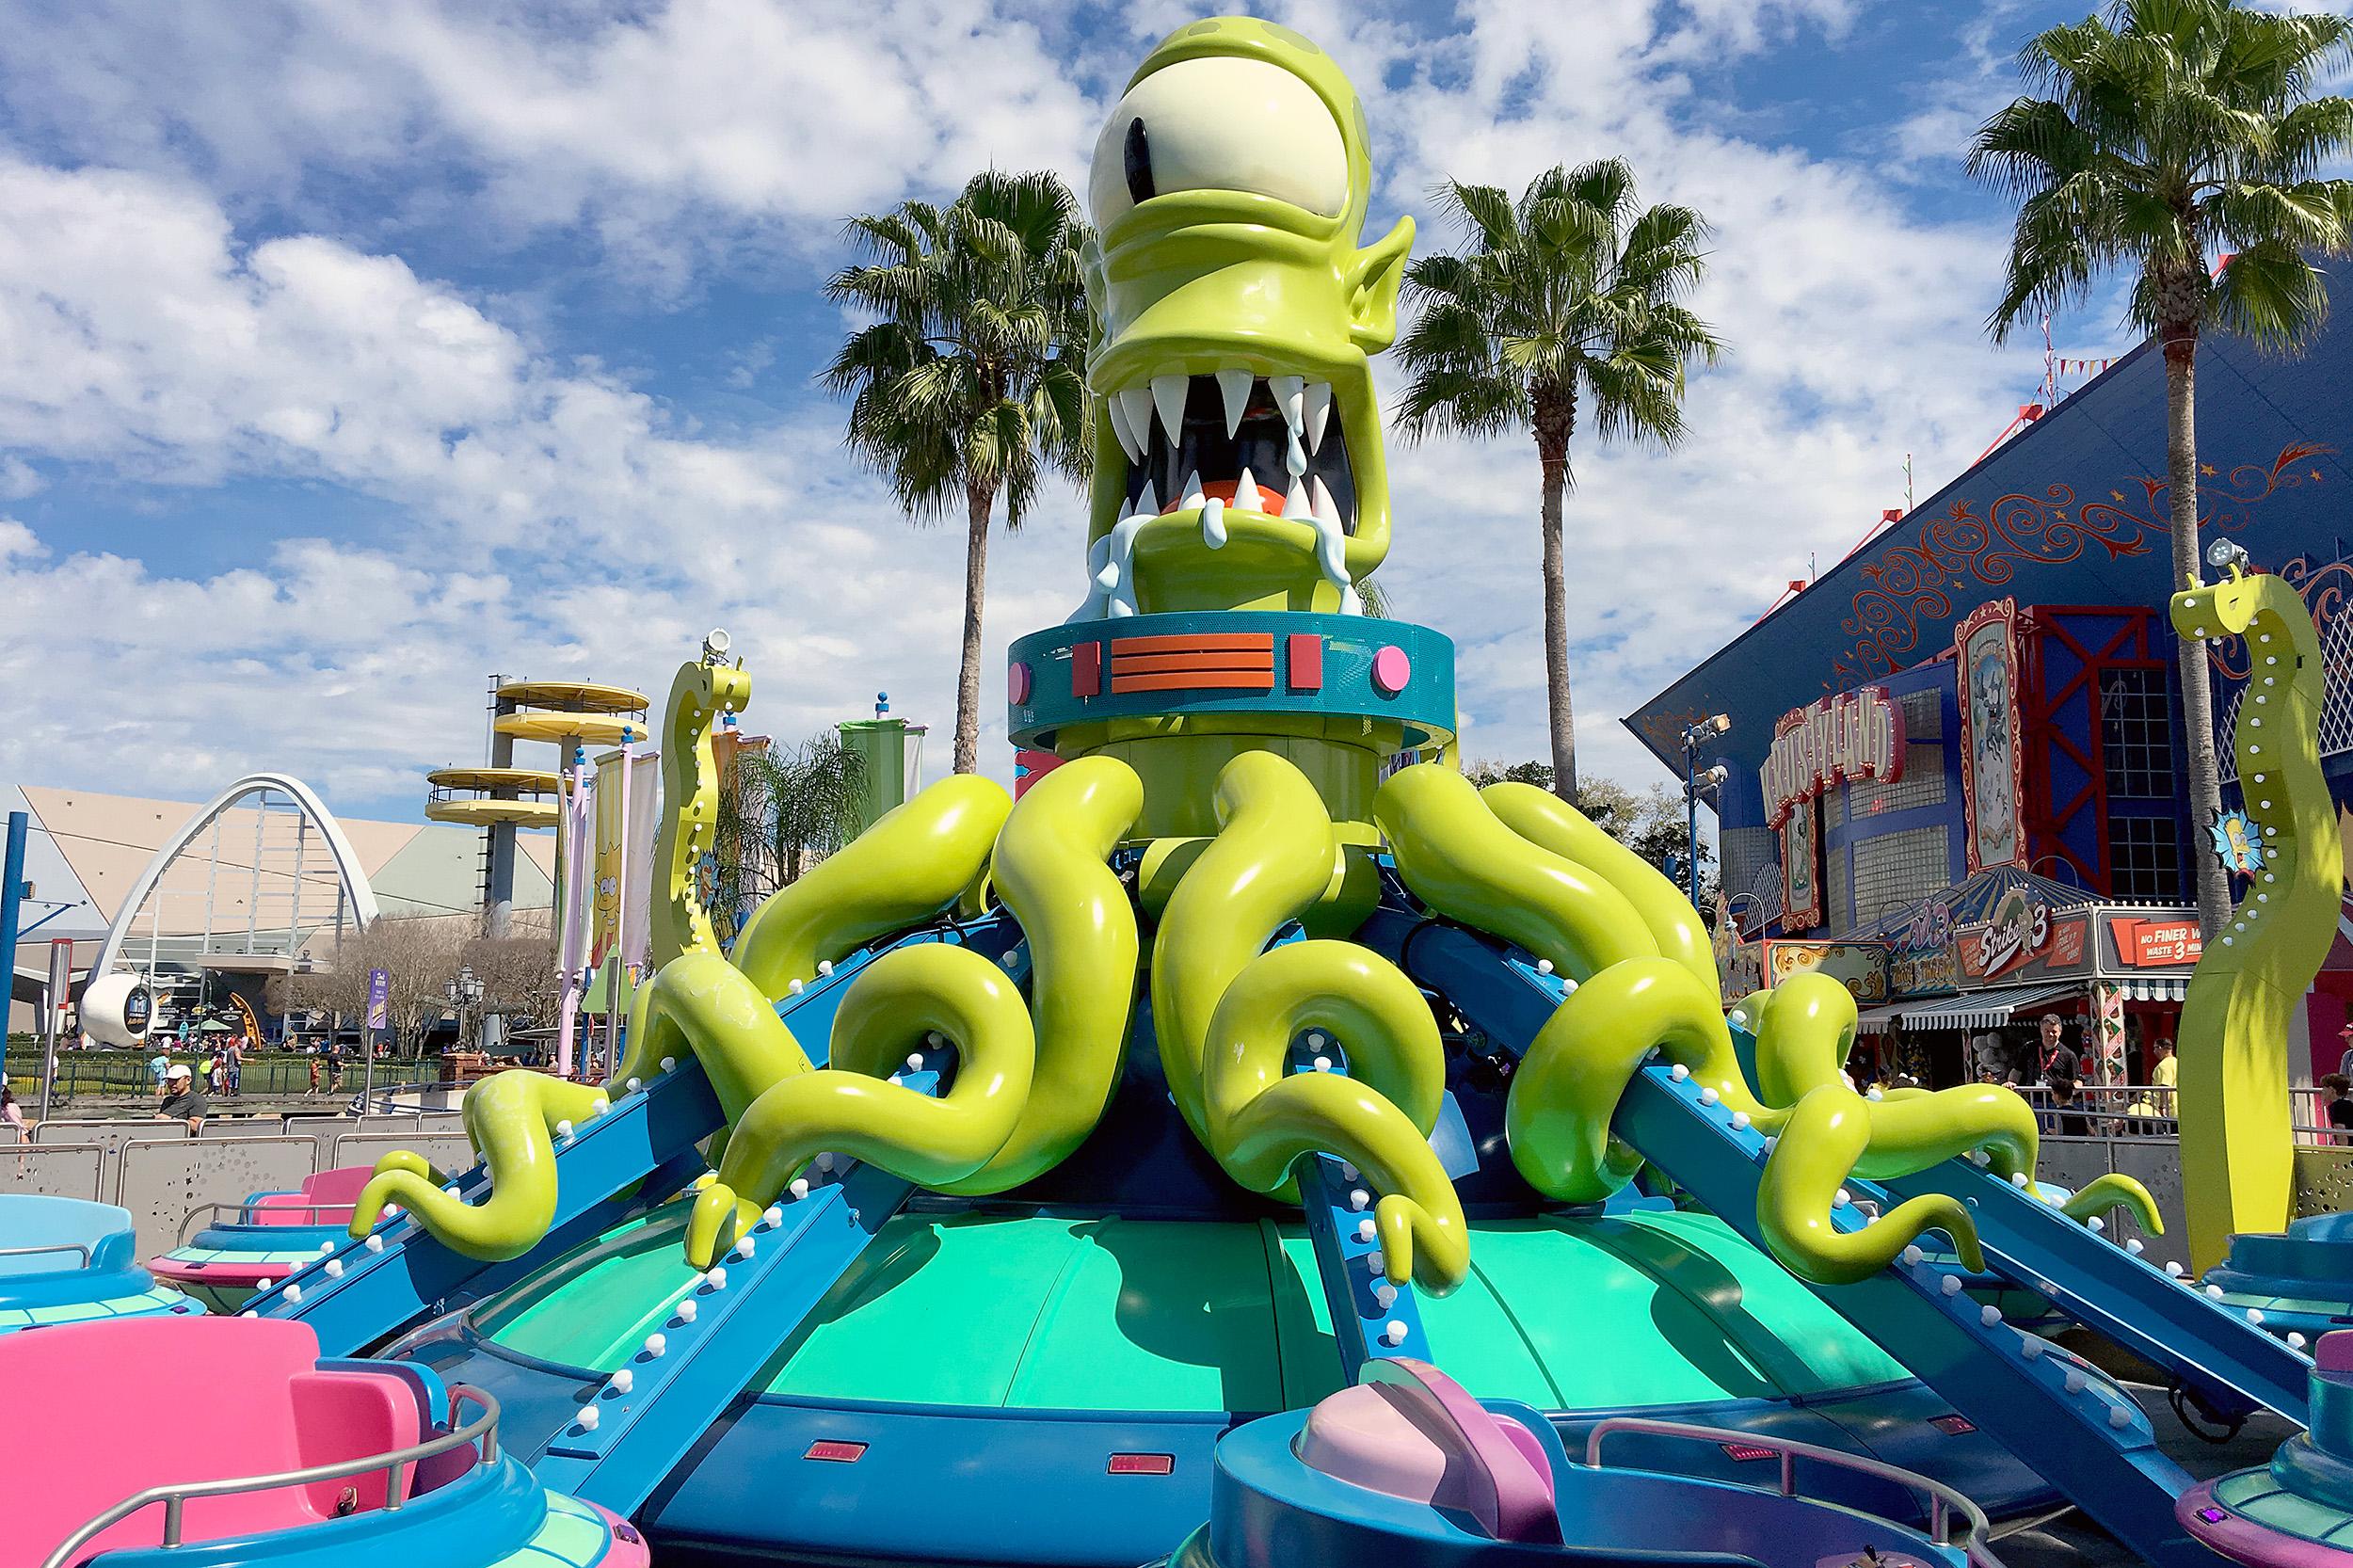 Kang & Kodos Twirl 'n' Hurl Universal Studios Florida Åkattraktion Simpsons